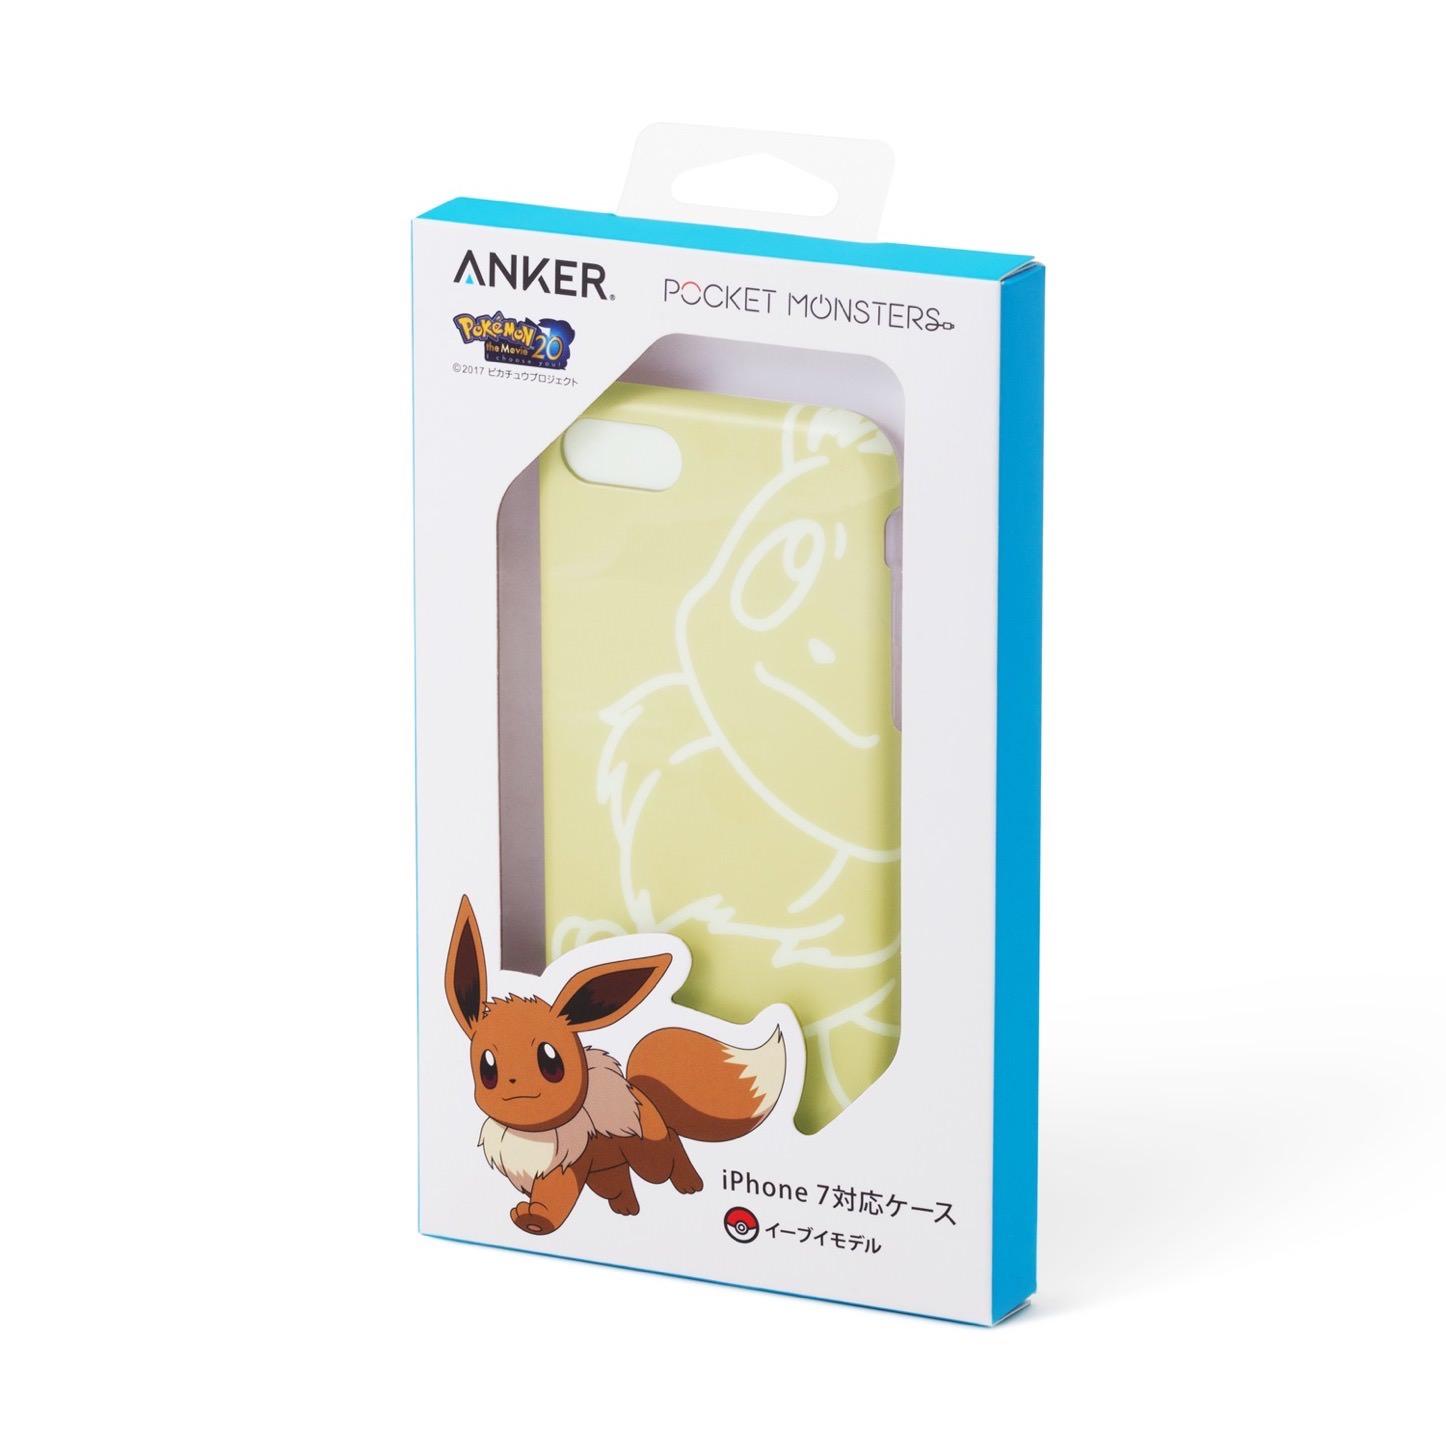 Anker-Pokemon-Mobile-Accessories-12.jpg